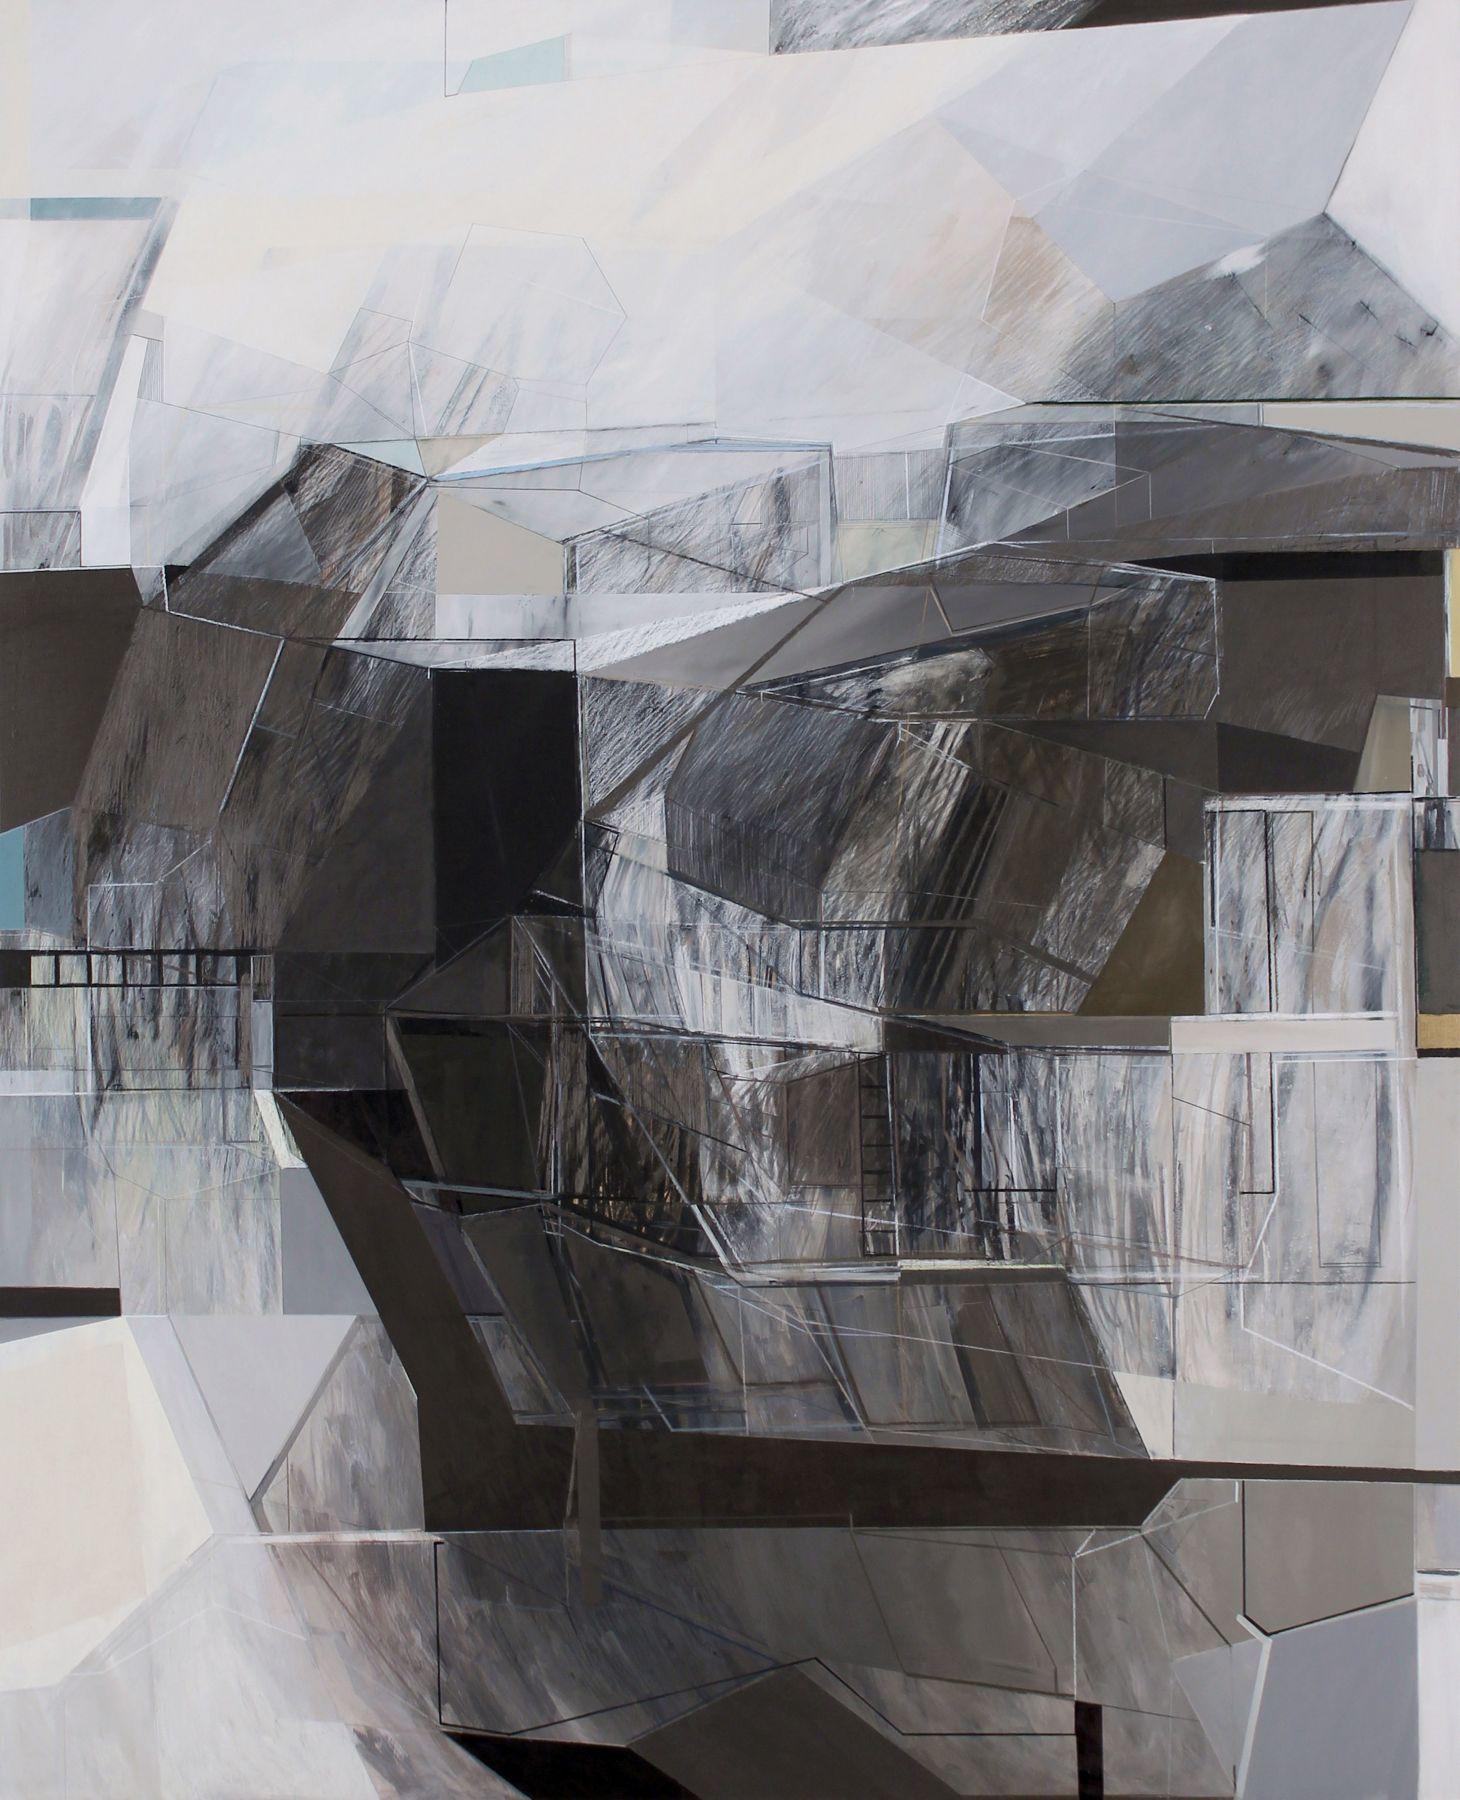 No Land. No Thing #00, (2018) - Susana Chasse